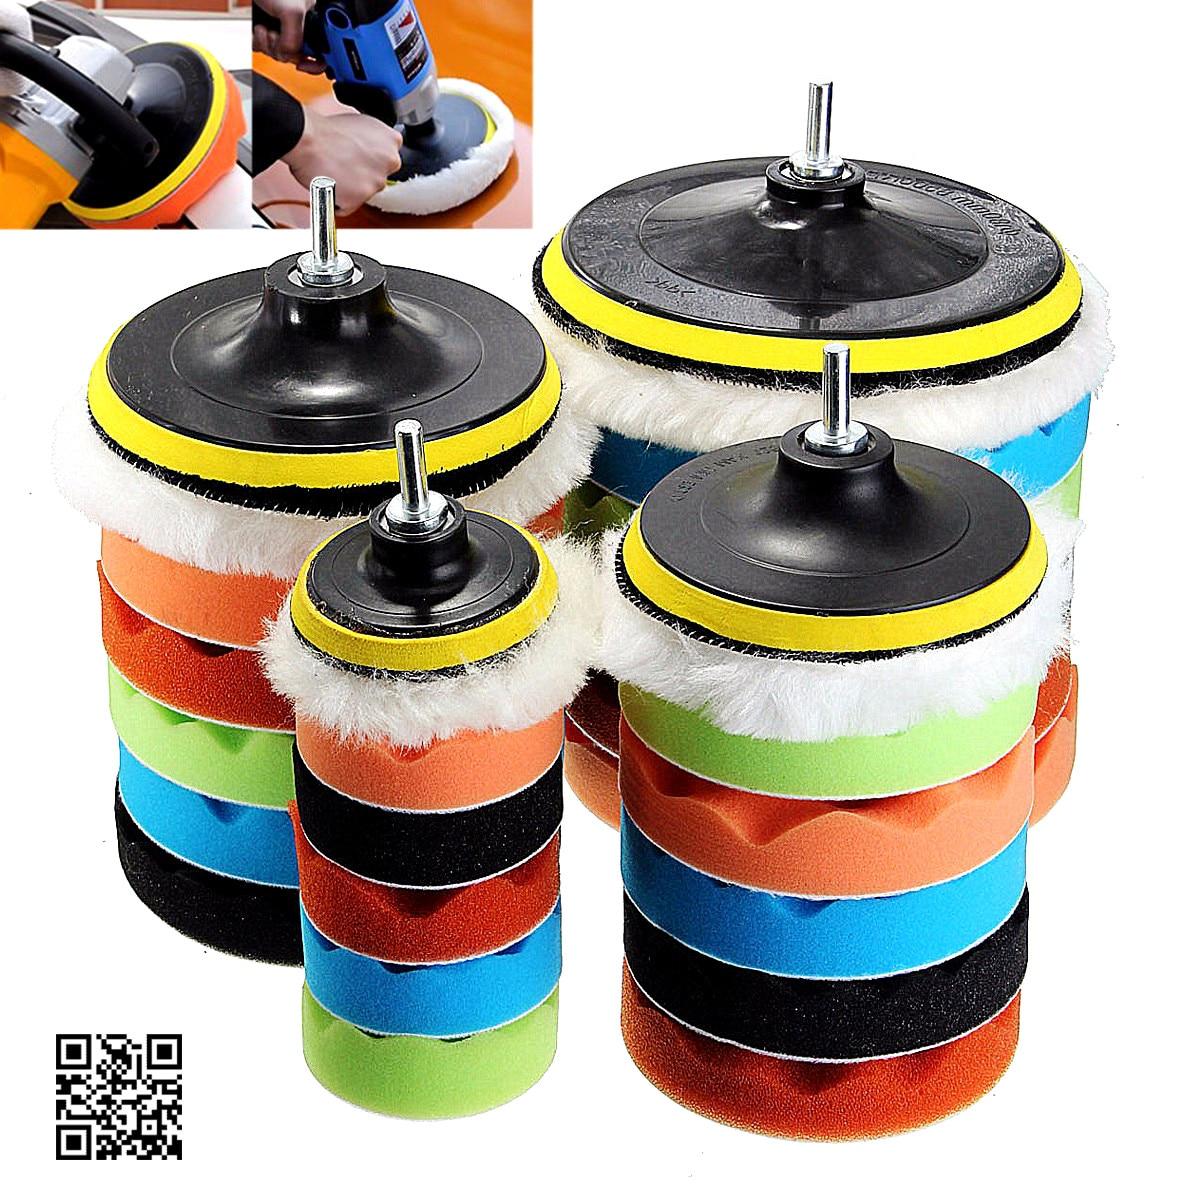 Hand-Tool-Kit Polishing-Pad Car-Polisher Compound for 7x3''5''6''7''buffing-Sponge